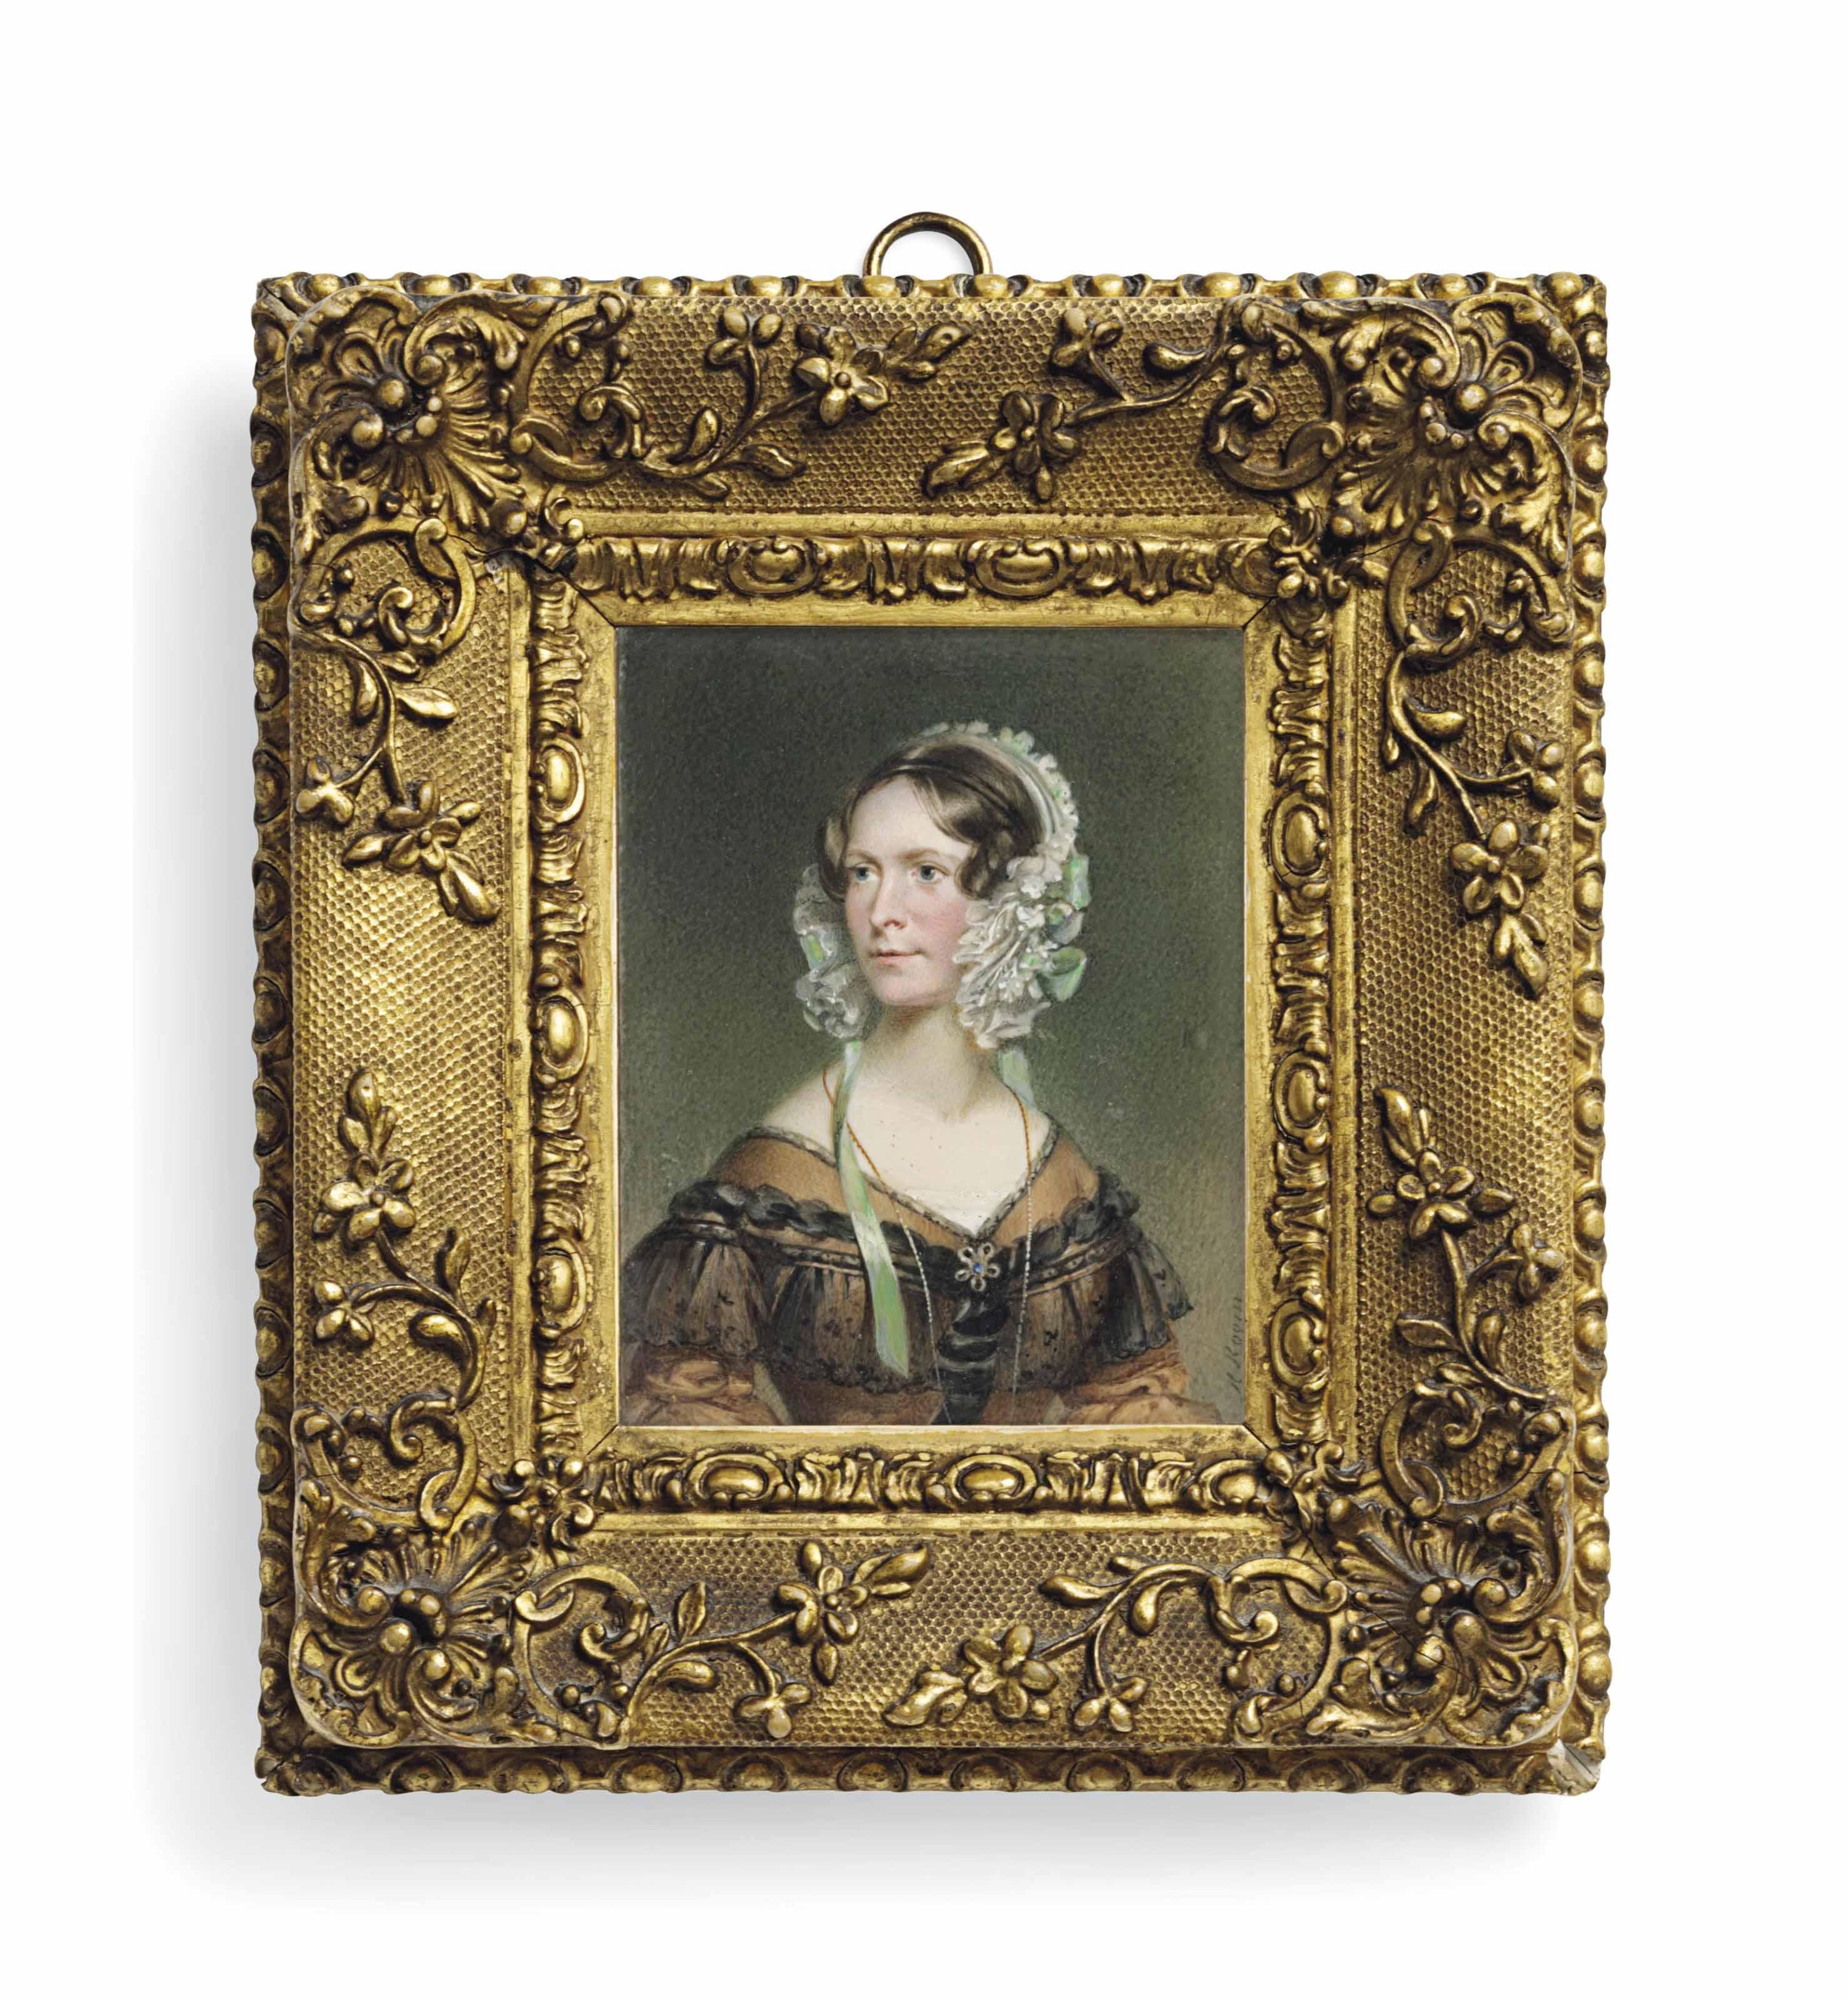 HENRY ROOM (BRITISH, 1802-1850)